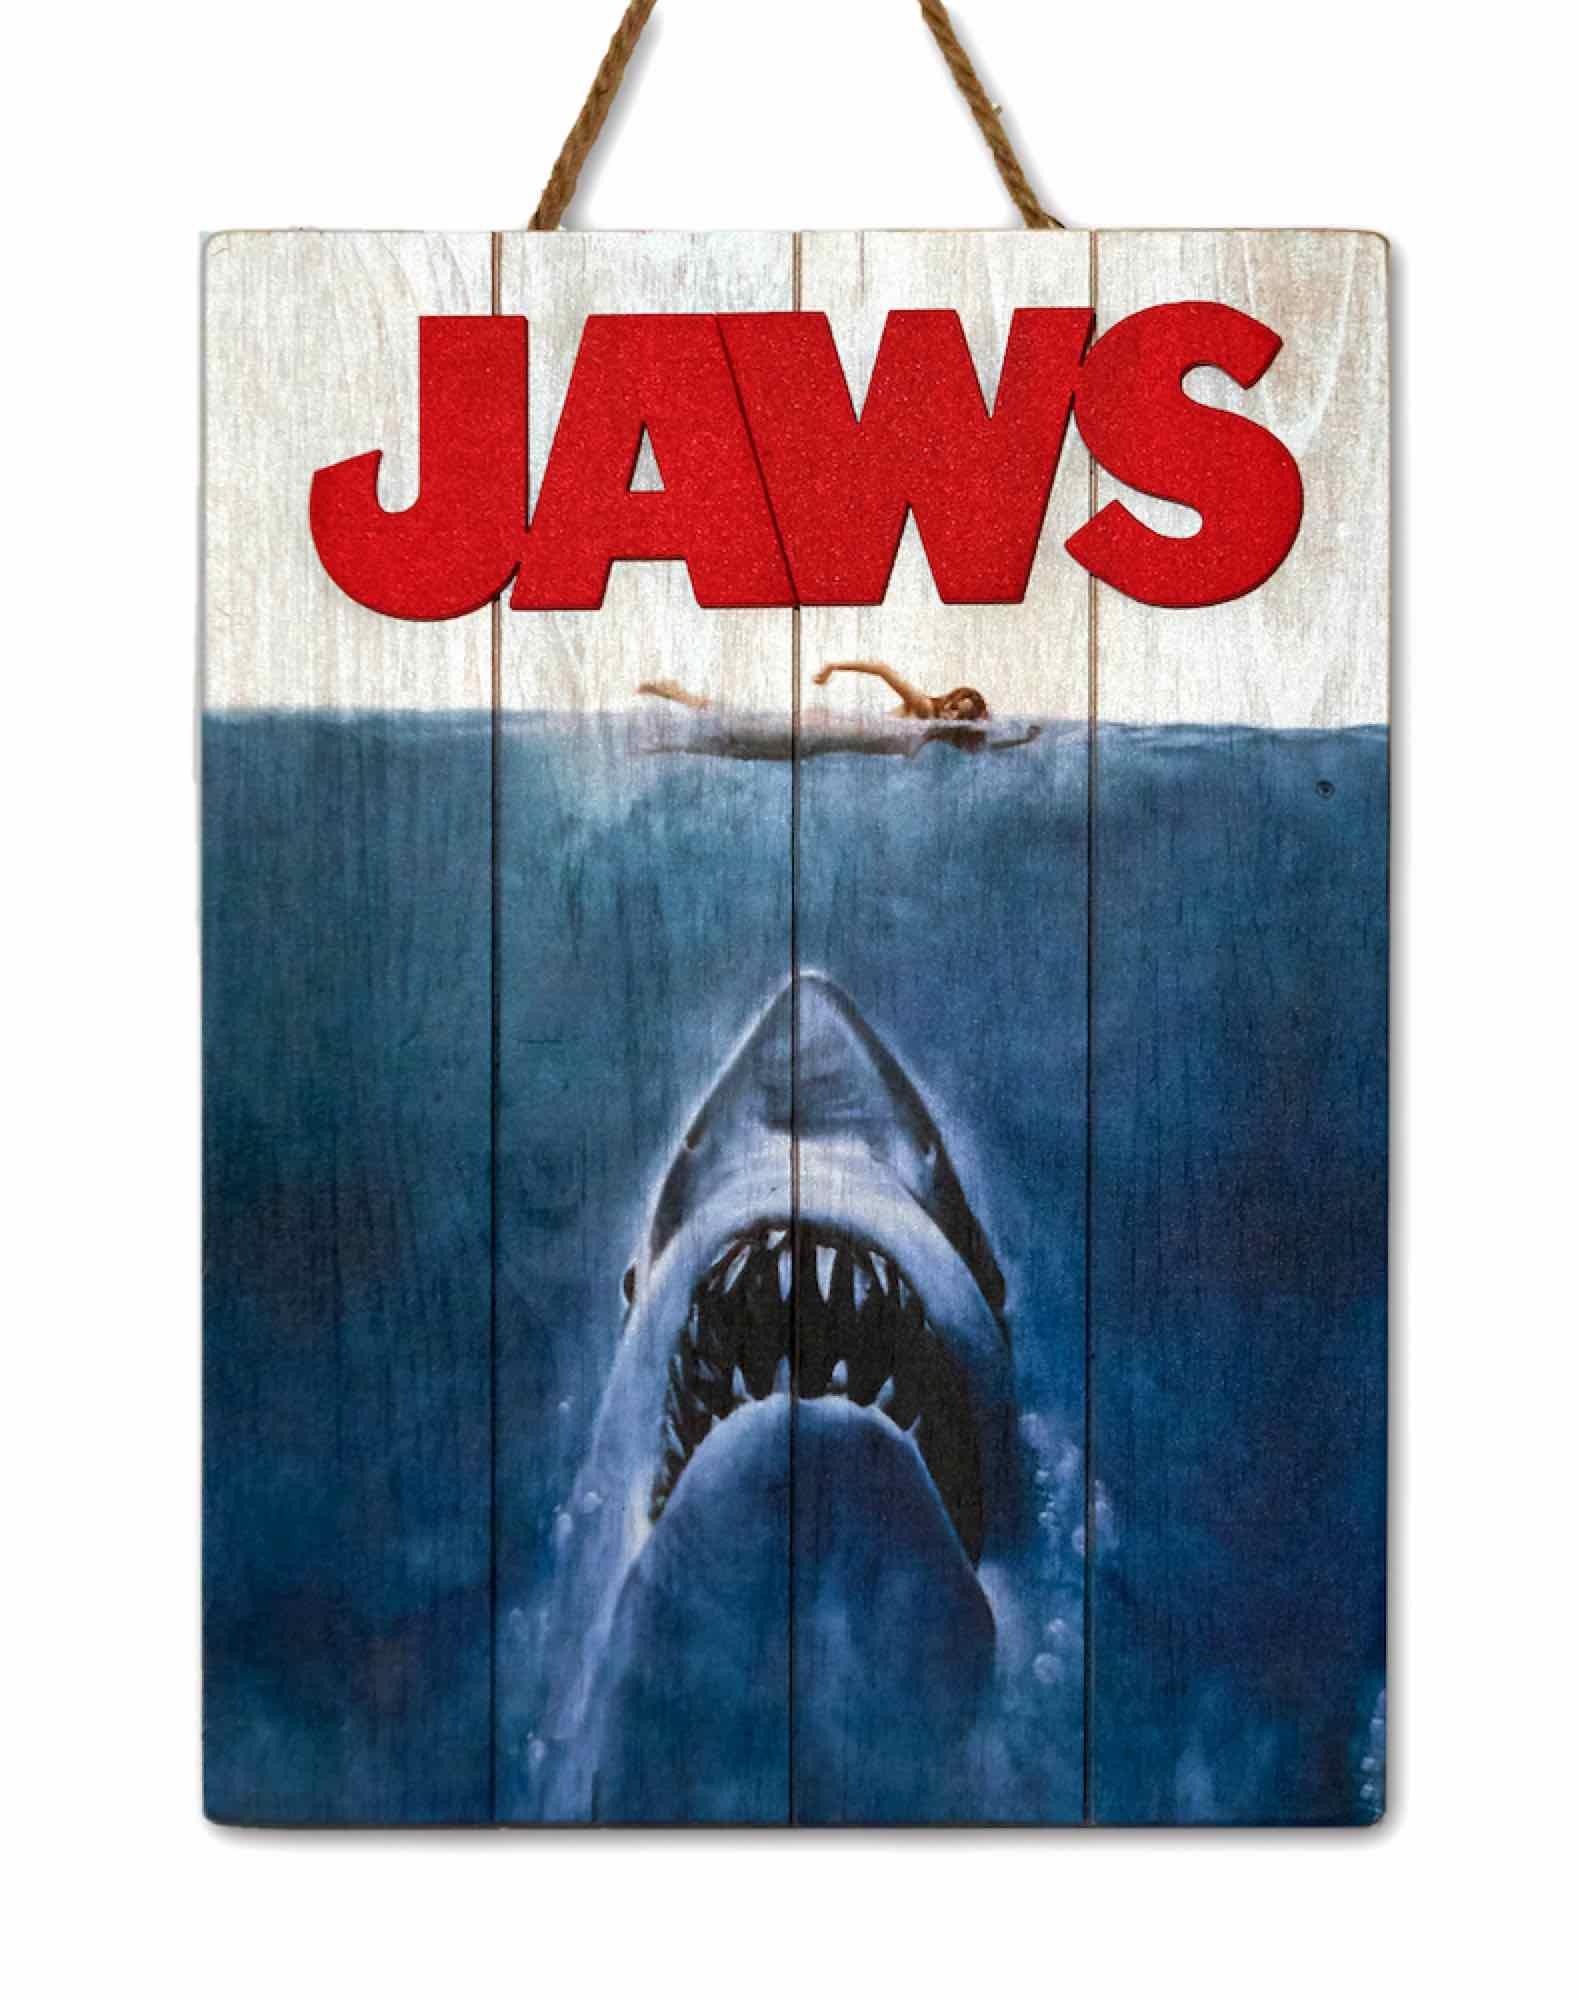 JAWS 1975 CARTEL MADERA 30 X 40 CM WOODART 3D PRINT